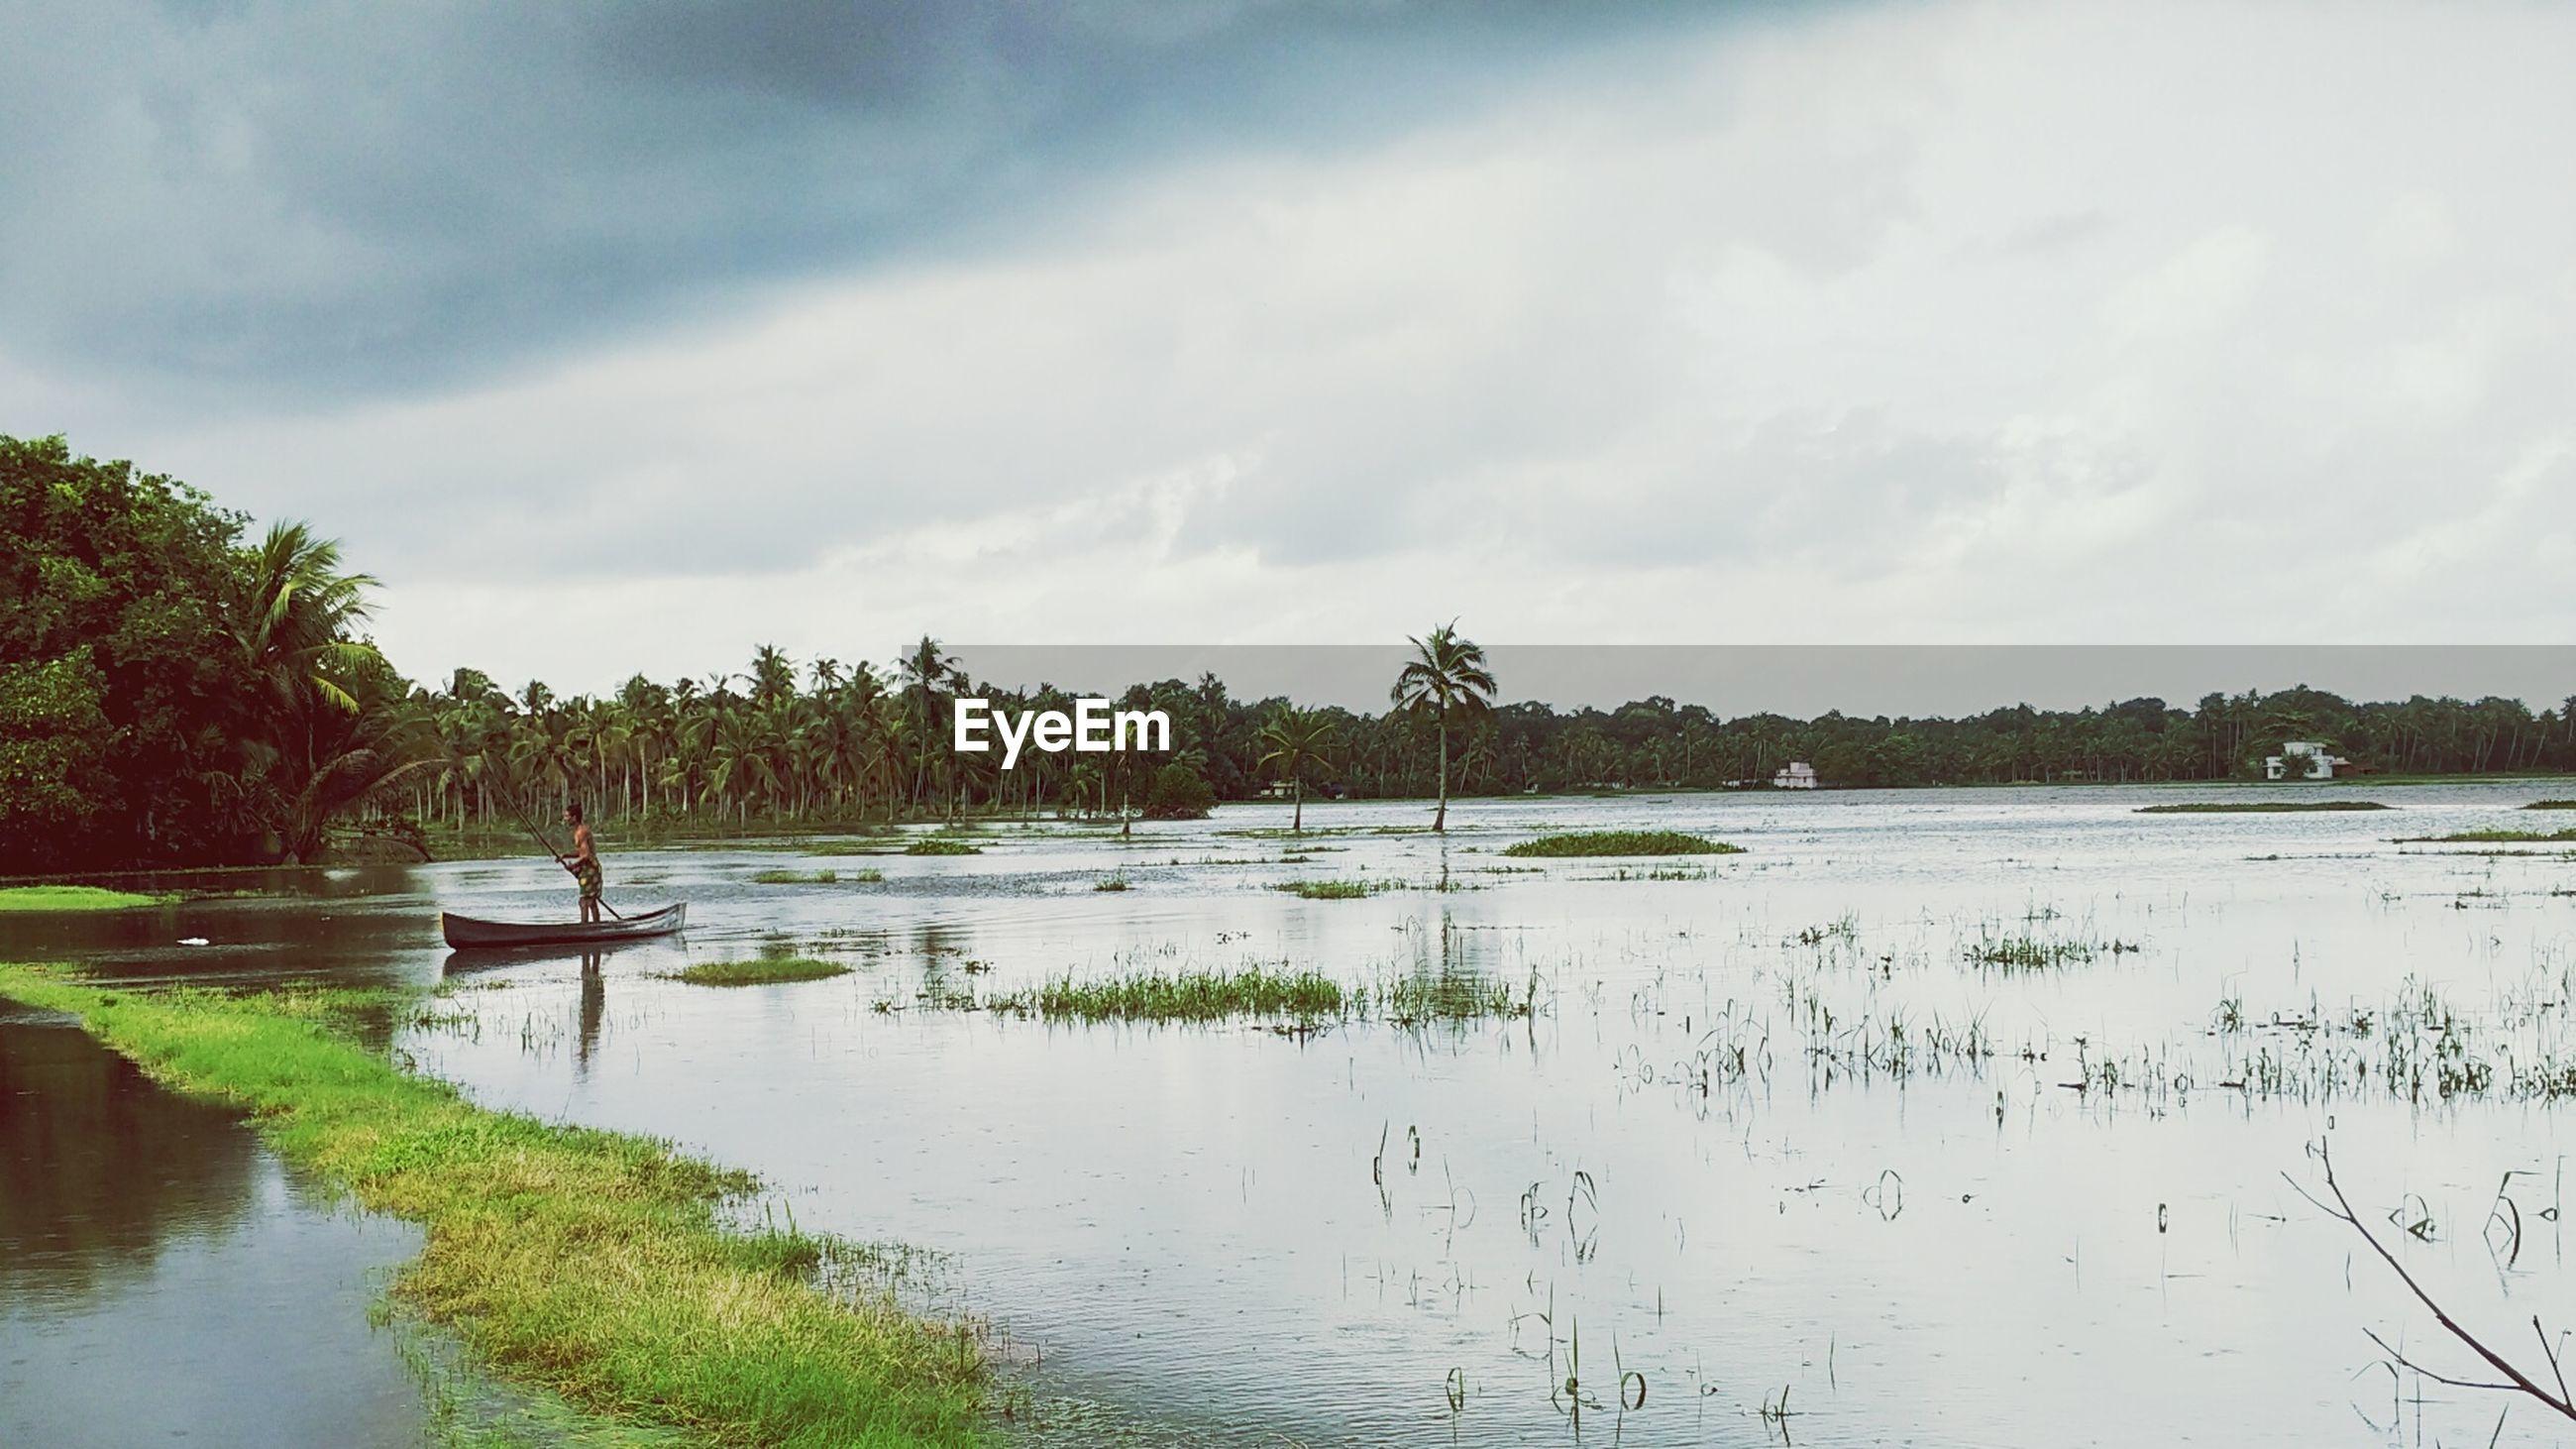 LAKE AGAINST SKY